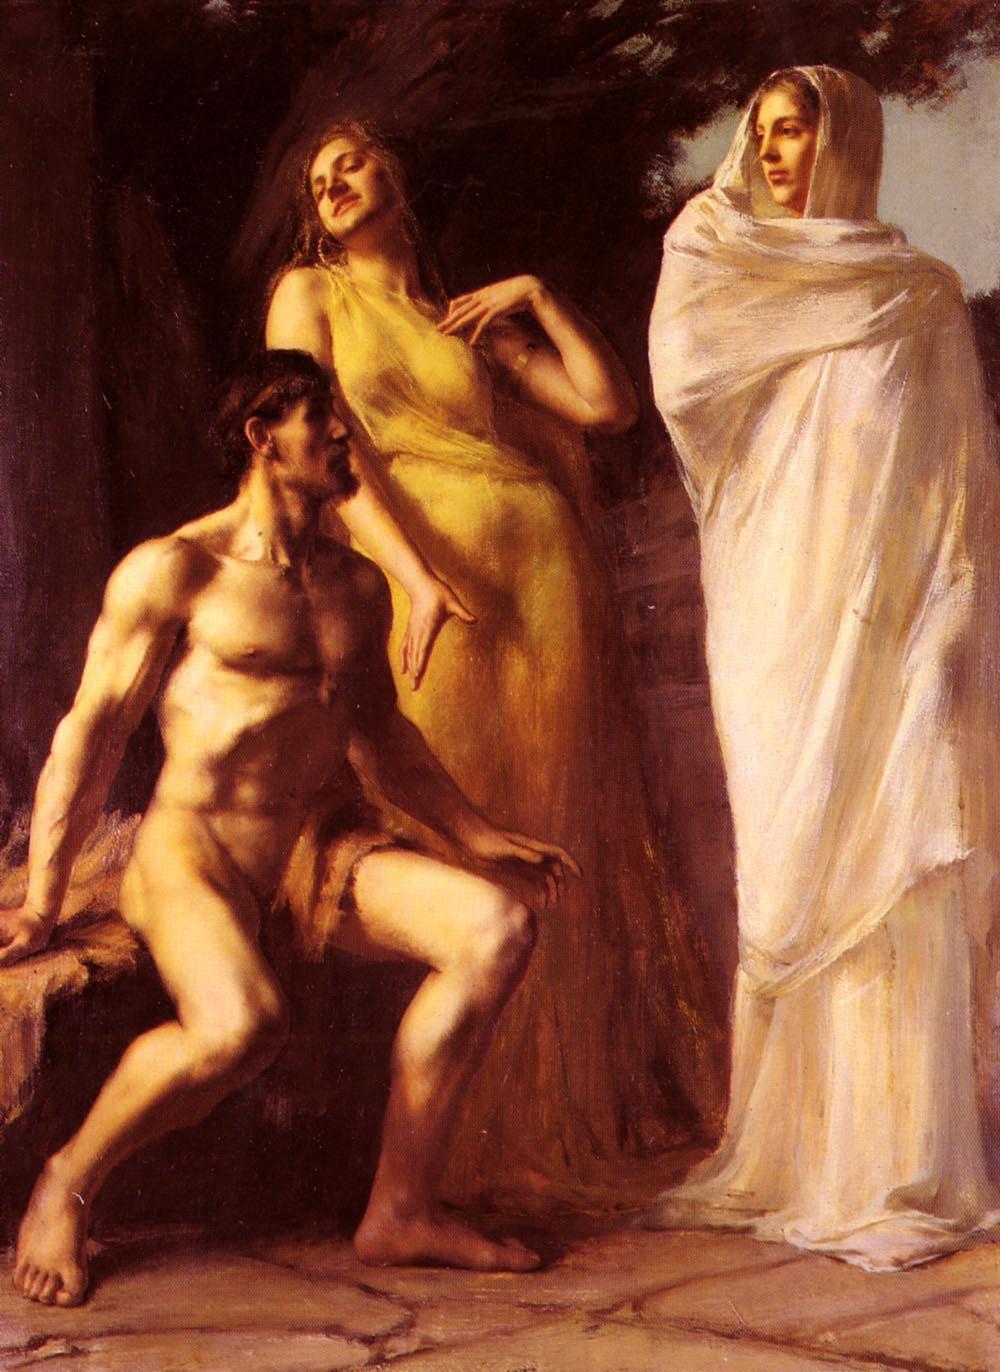 Benner Emmanuel Michel Hercules Between Virtue And Vice | Emmanuel Benner | Oil Painting